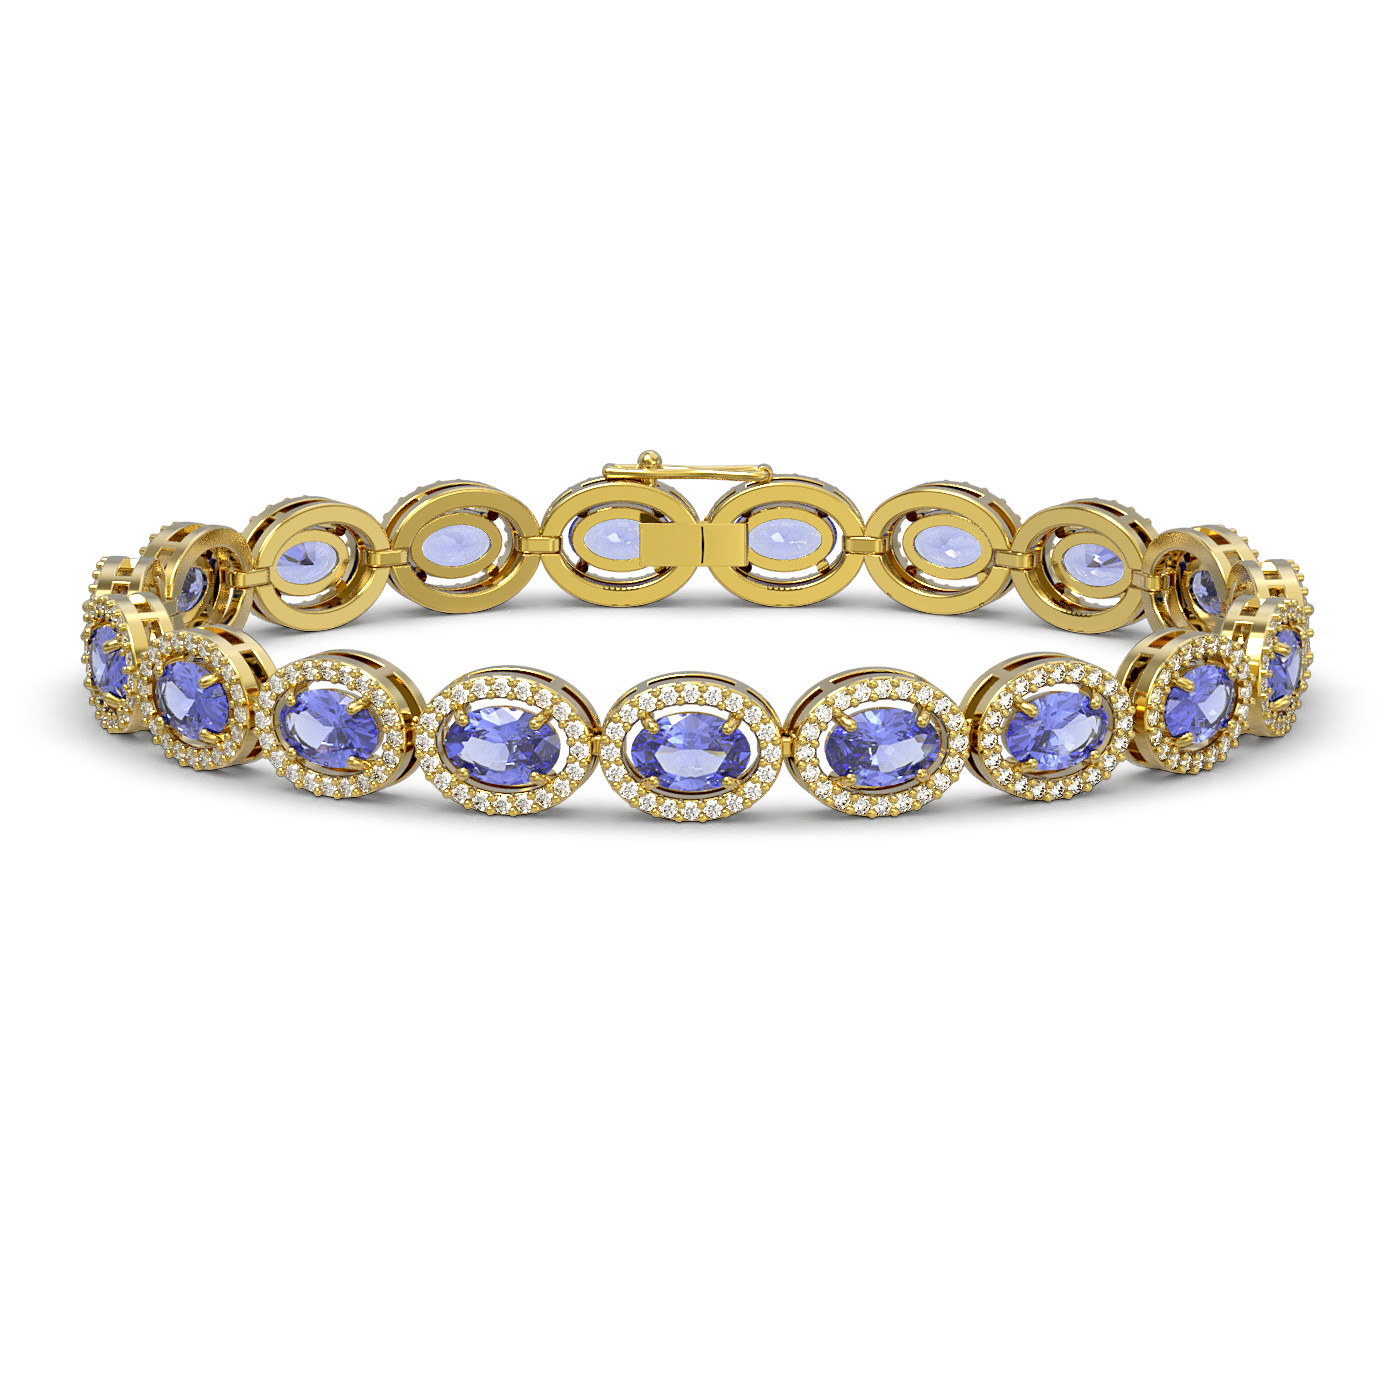 14.25 Ctw Tanzanite & Diamond Bracelet Yellow Gold